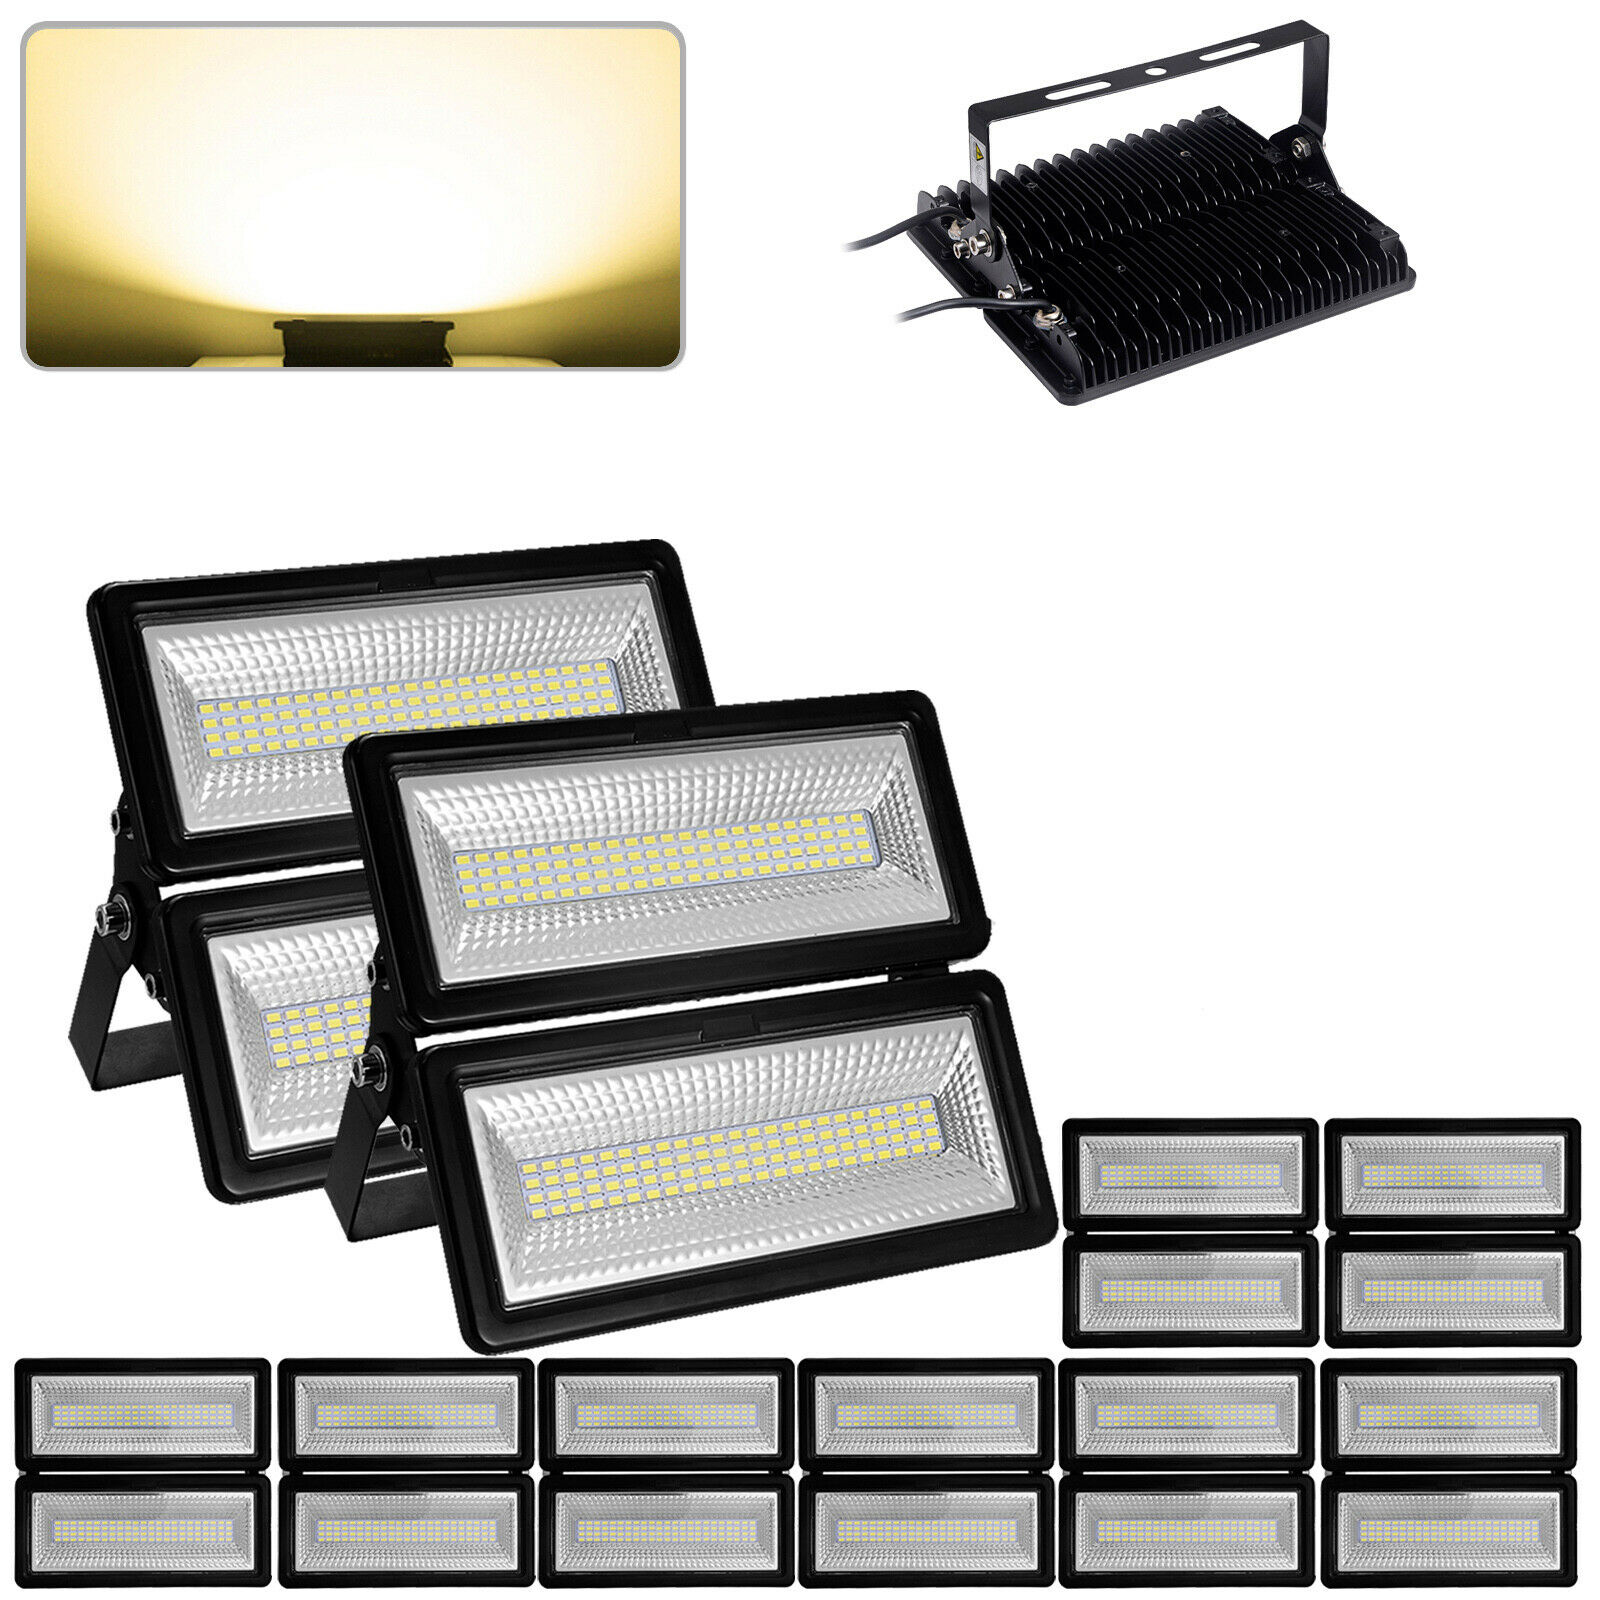 10 x LED módulo proyectores 100W proyector proyector lámpara luces blancoa cálida